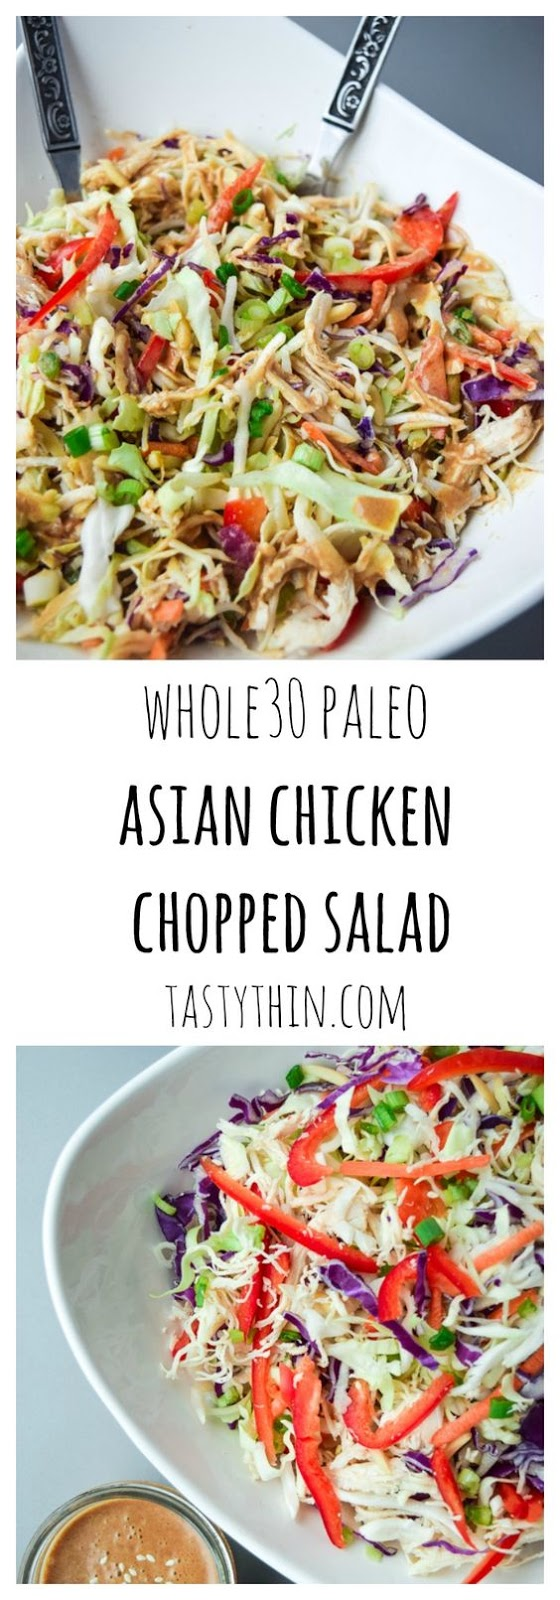 Asian Chicken Chopped Salad (Whole30 Paleo)